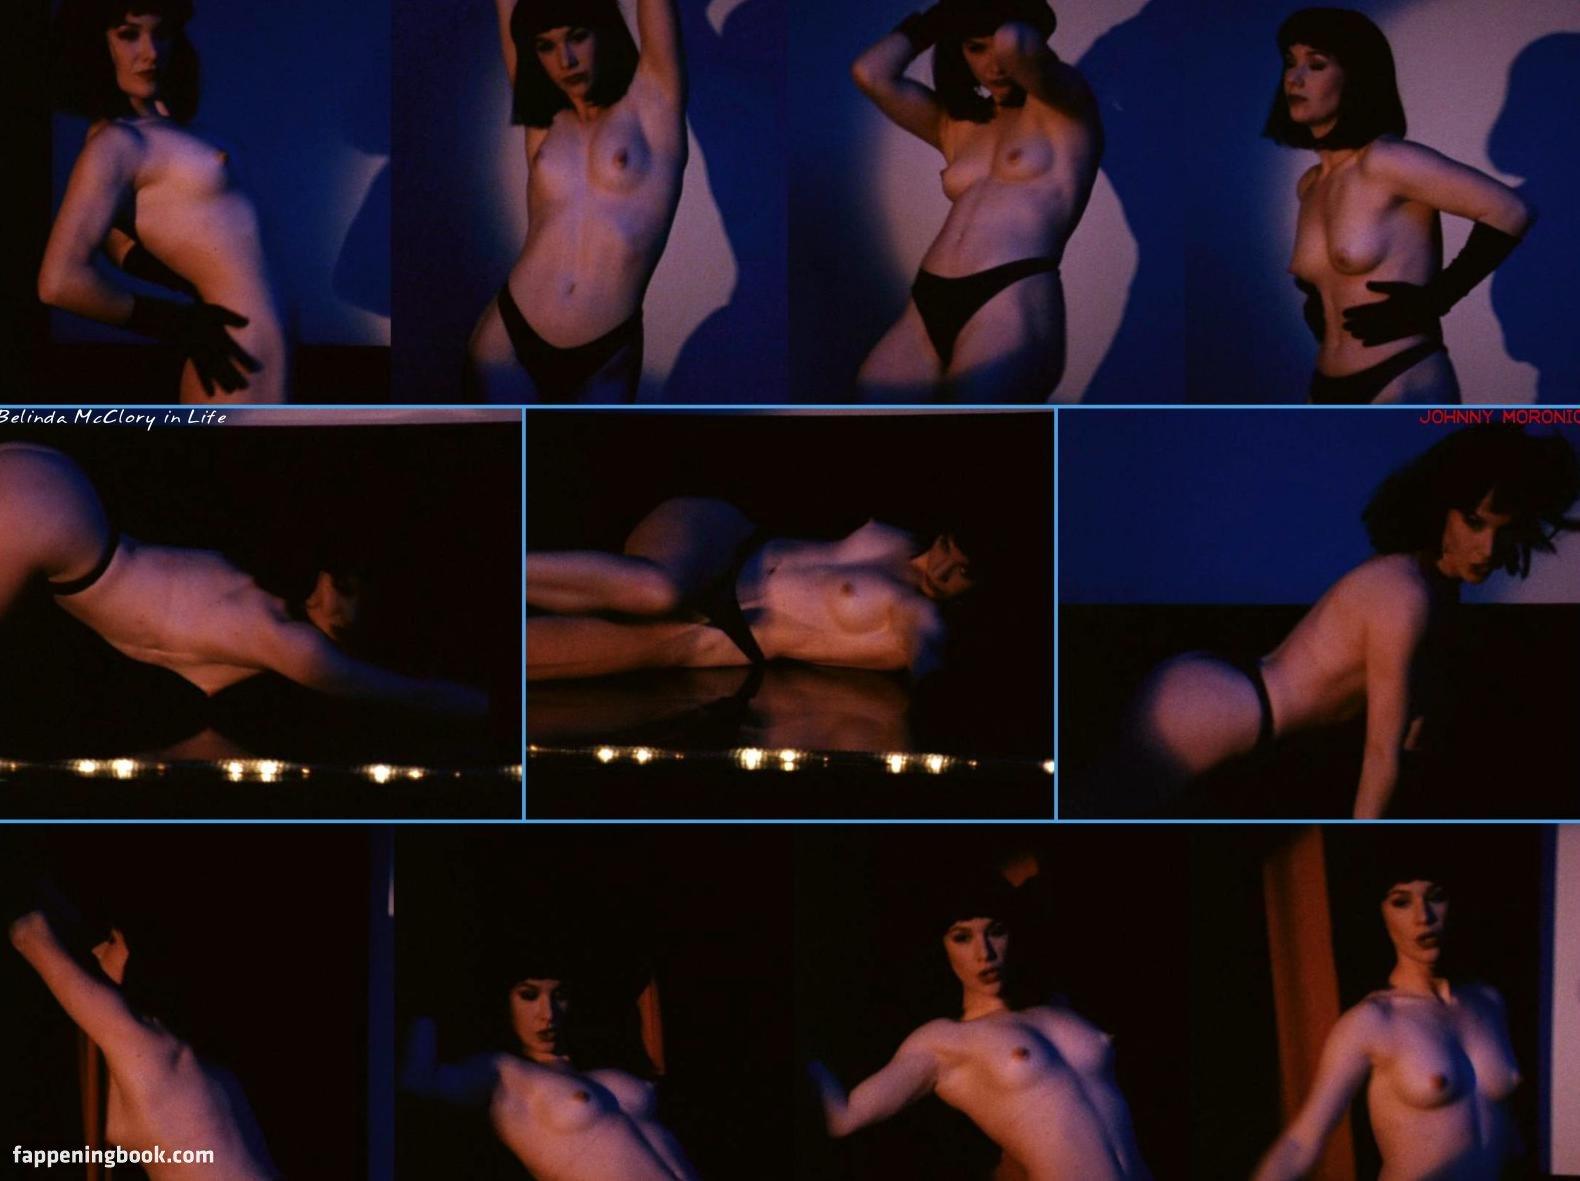 Nackt  Belinda McClory Belinda McClory